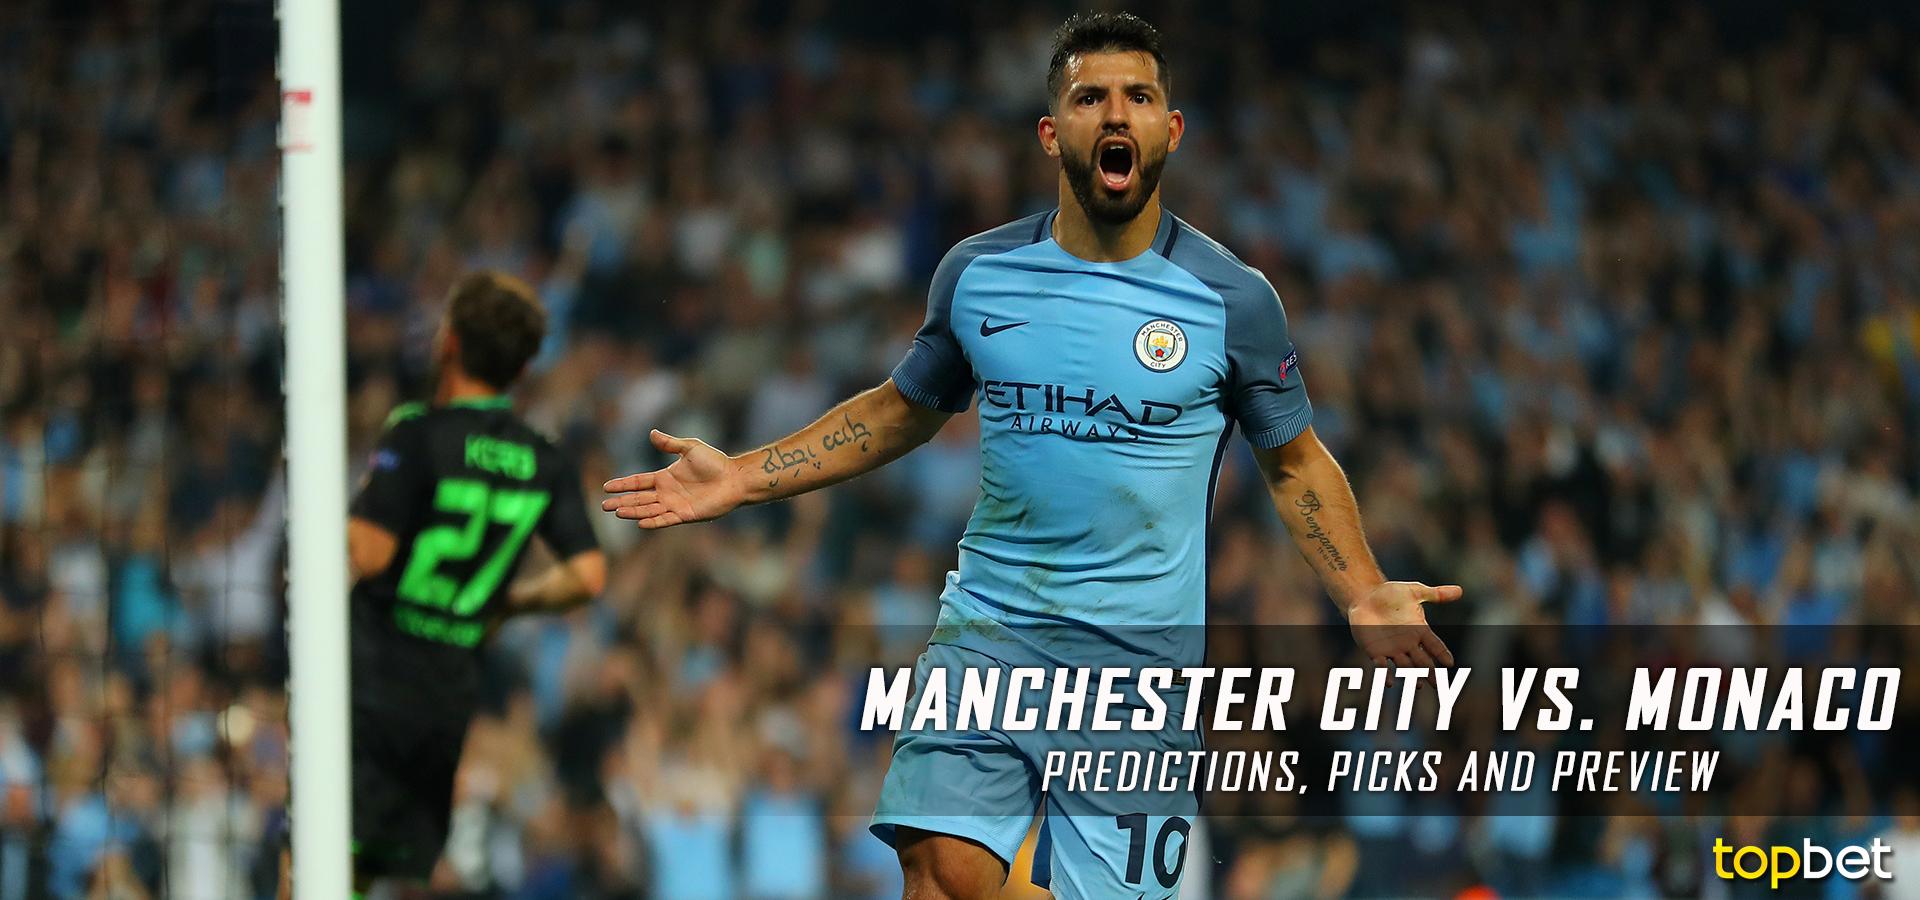 Barcelona Vs Manchester City Logo: Manchester City Vs Monaco Champions League Predictions & Picks